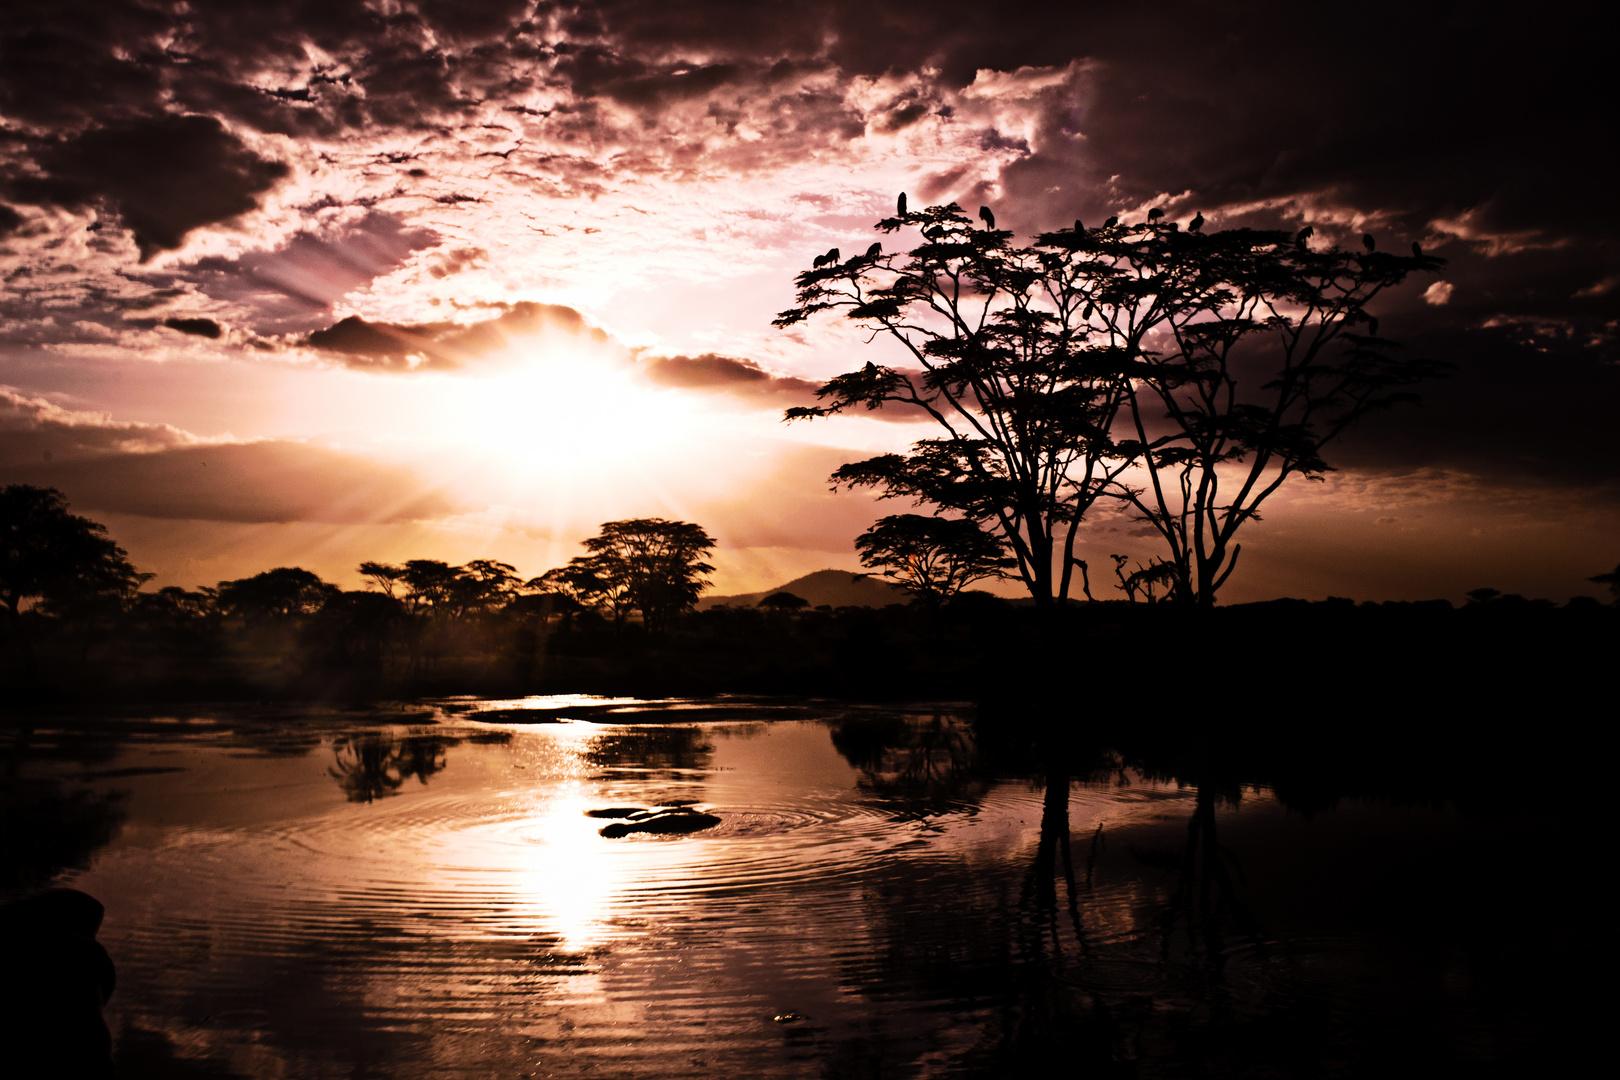 Lake in Serengeti